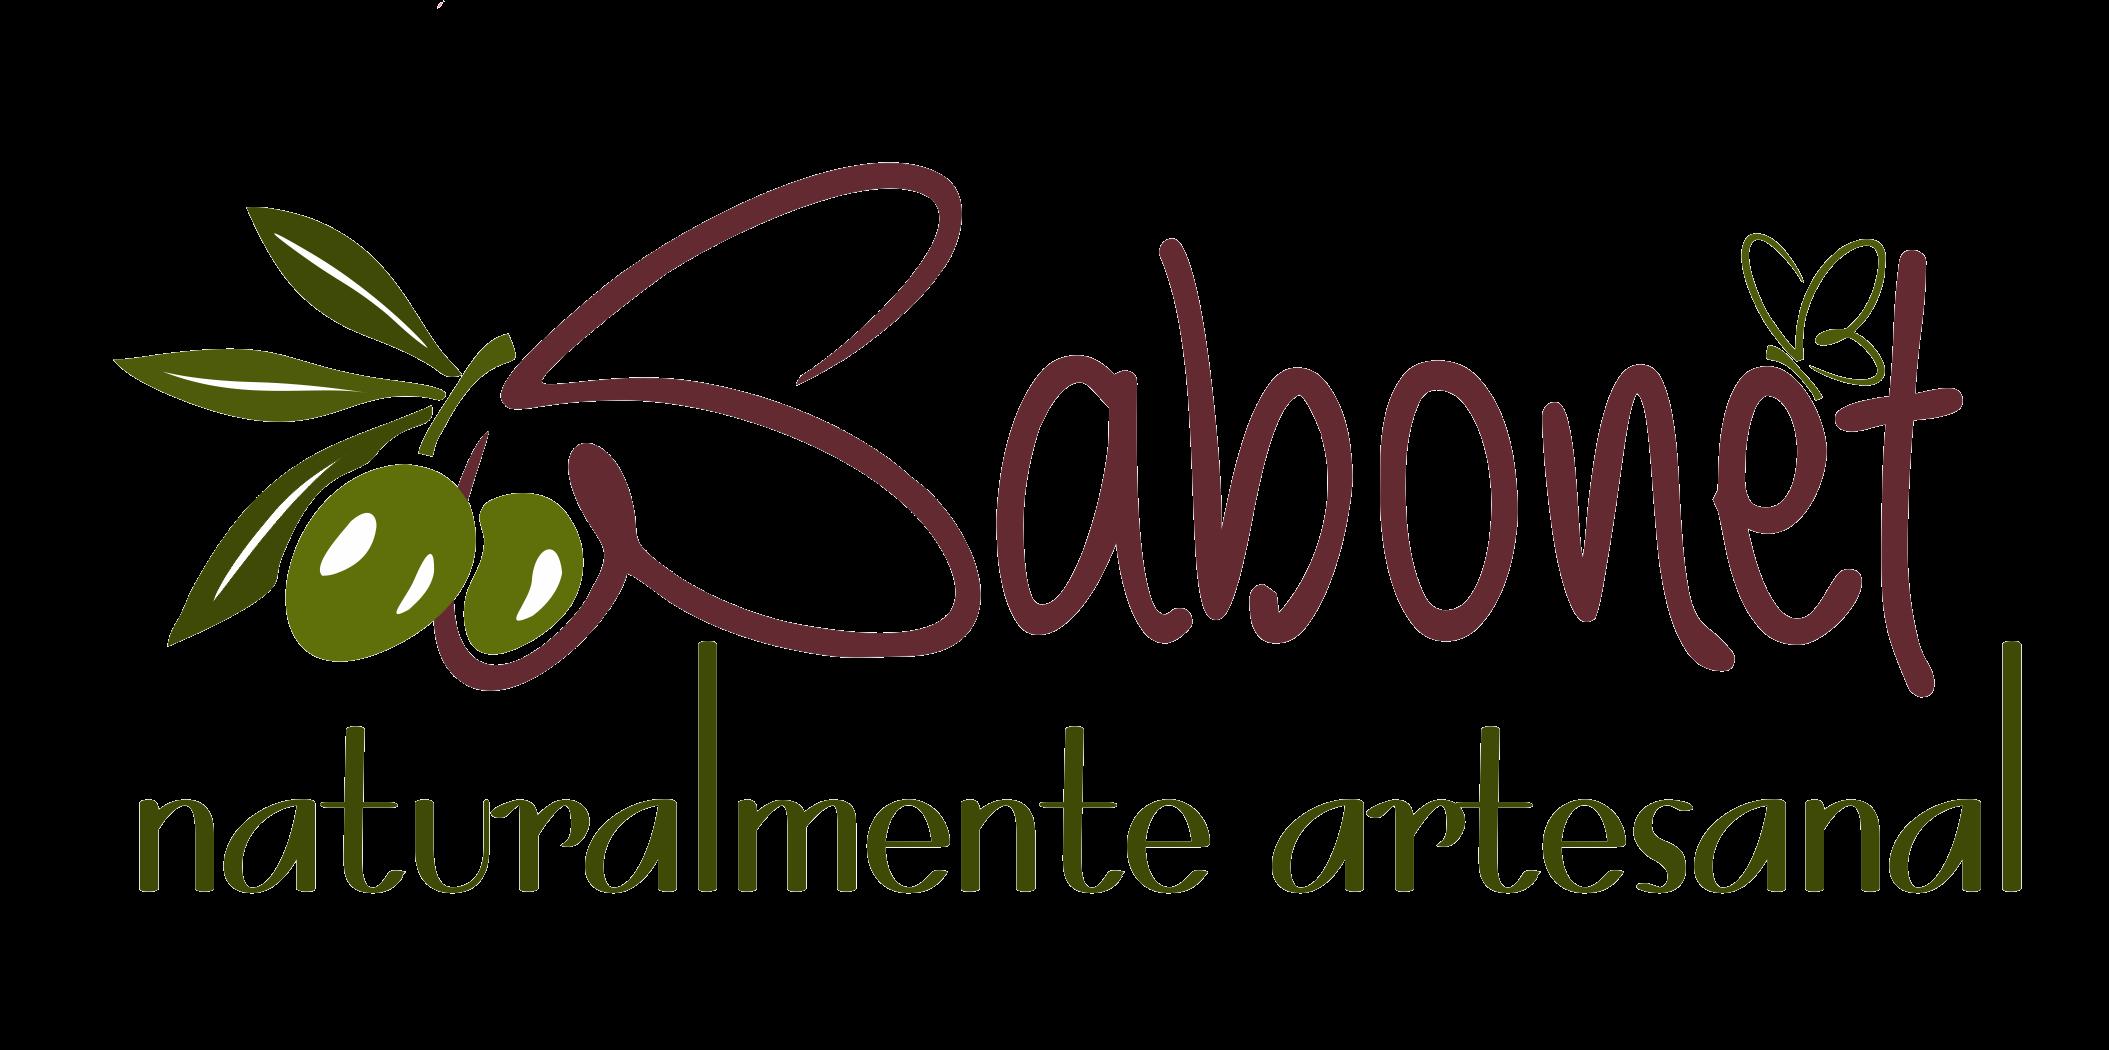 Sabonet